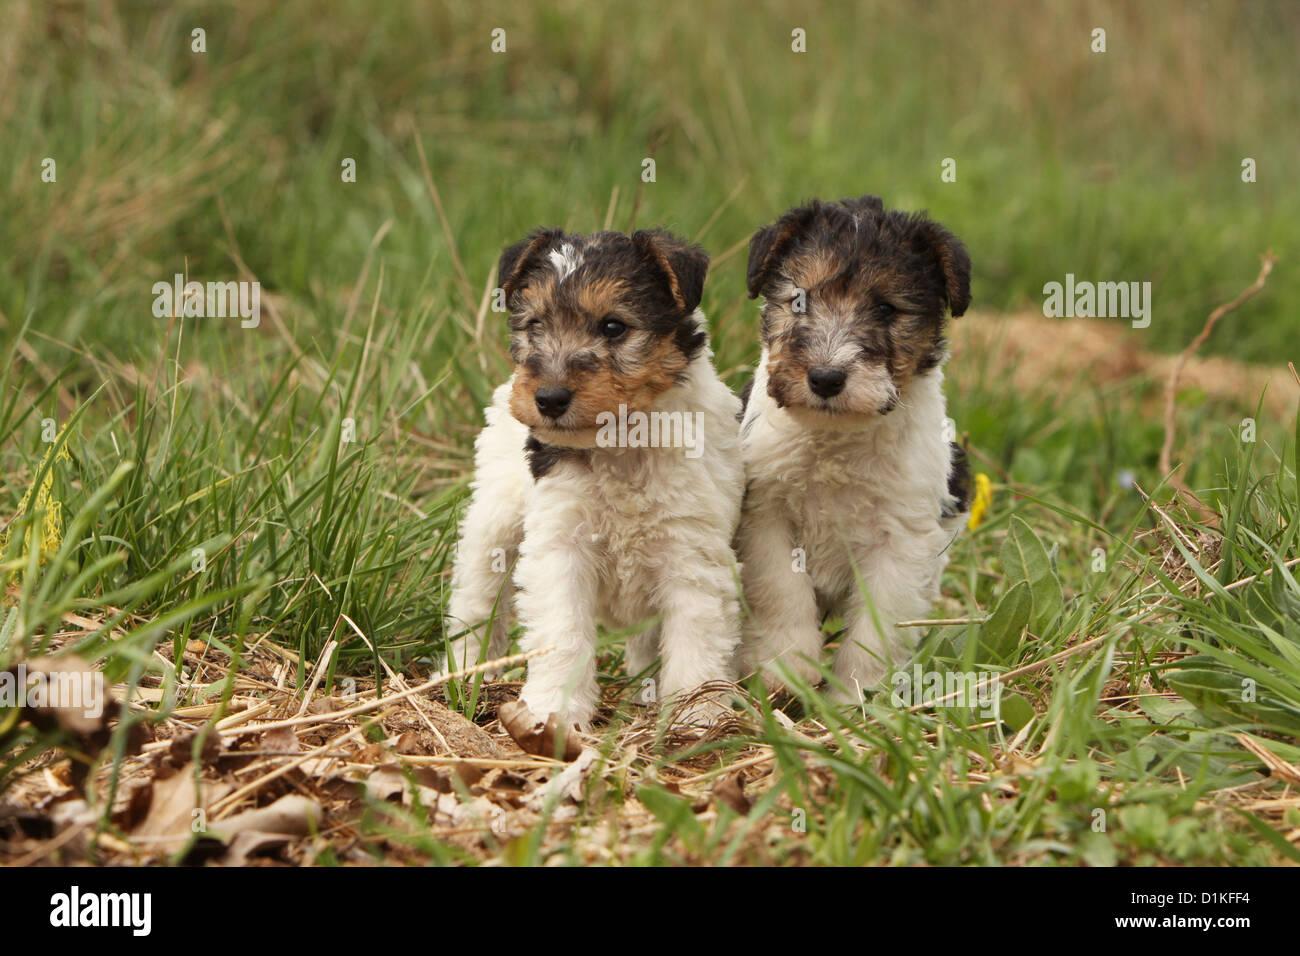 Nett Draht Fox Terrier Züchter Bilder - Der Schaltplan - greigo.com